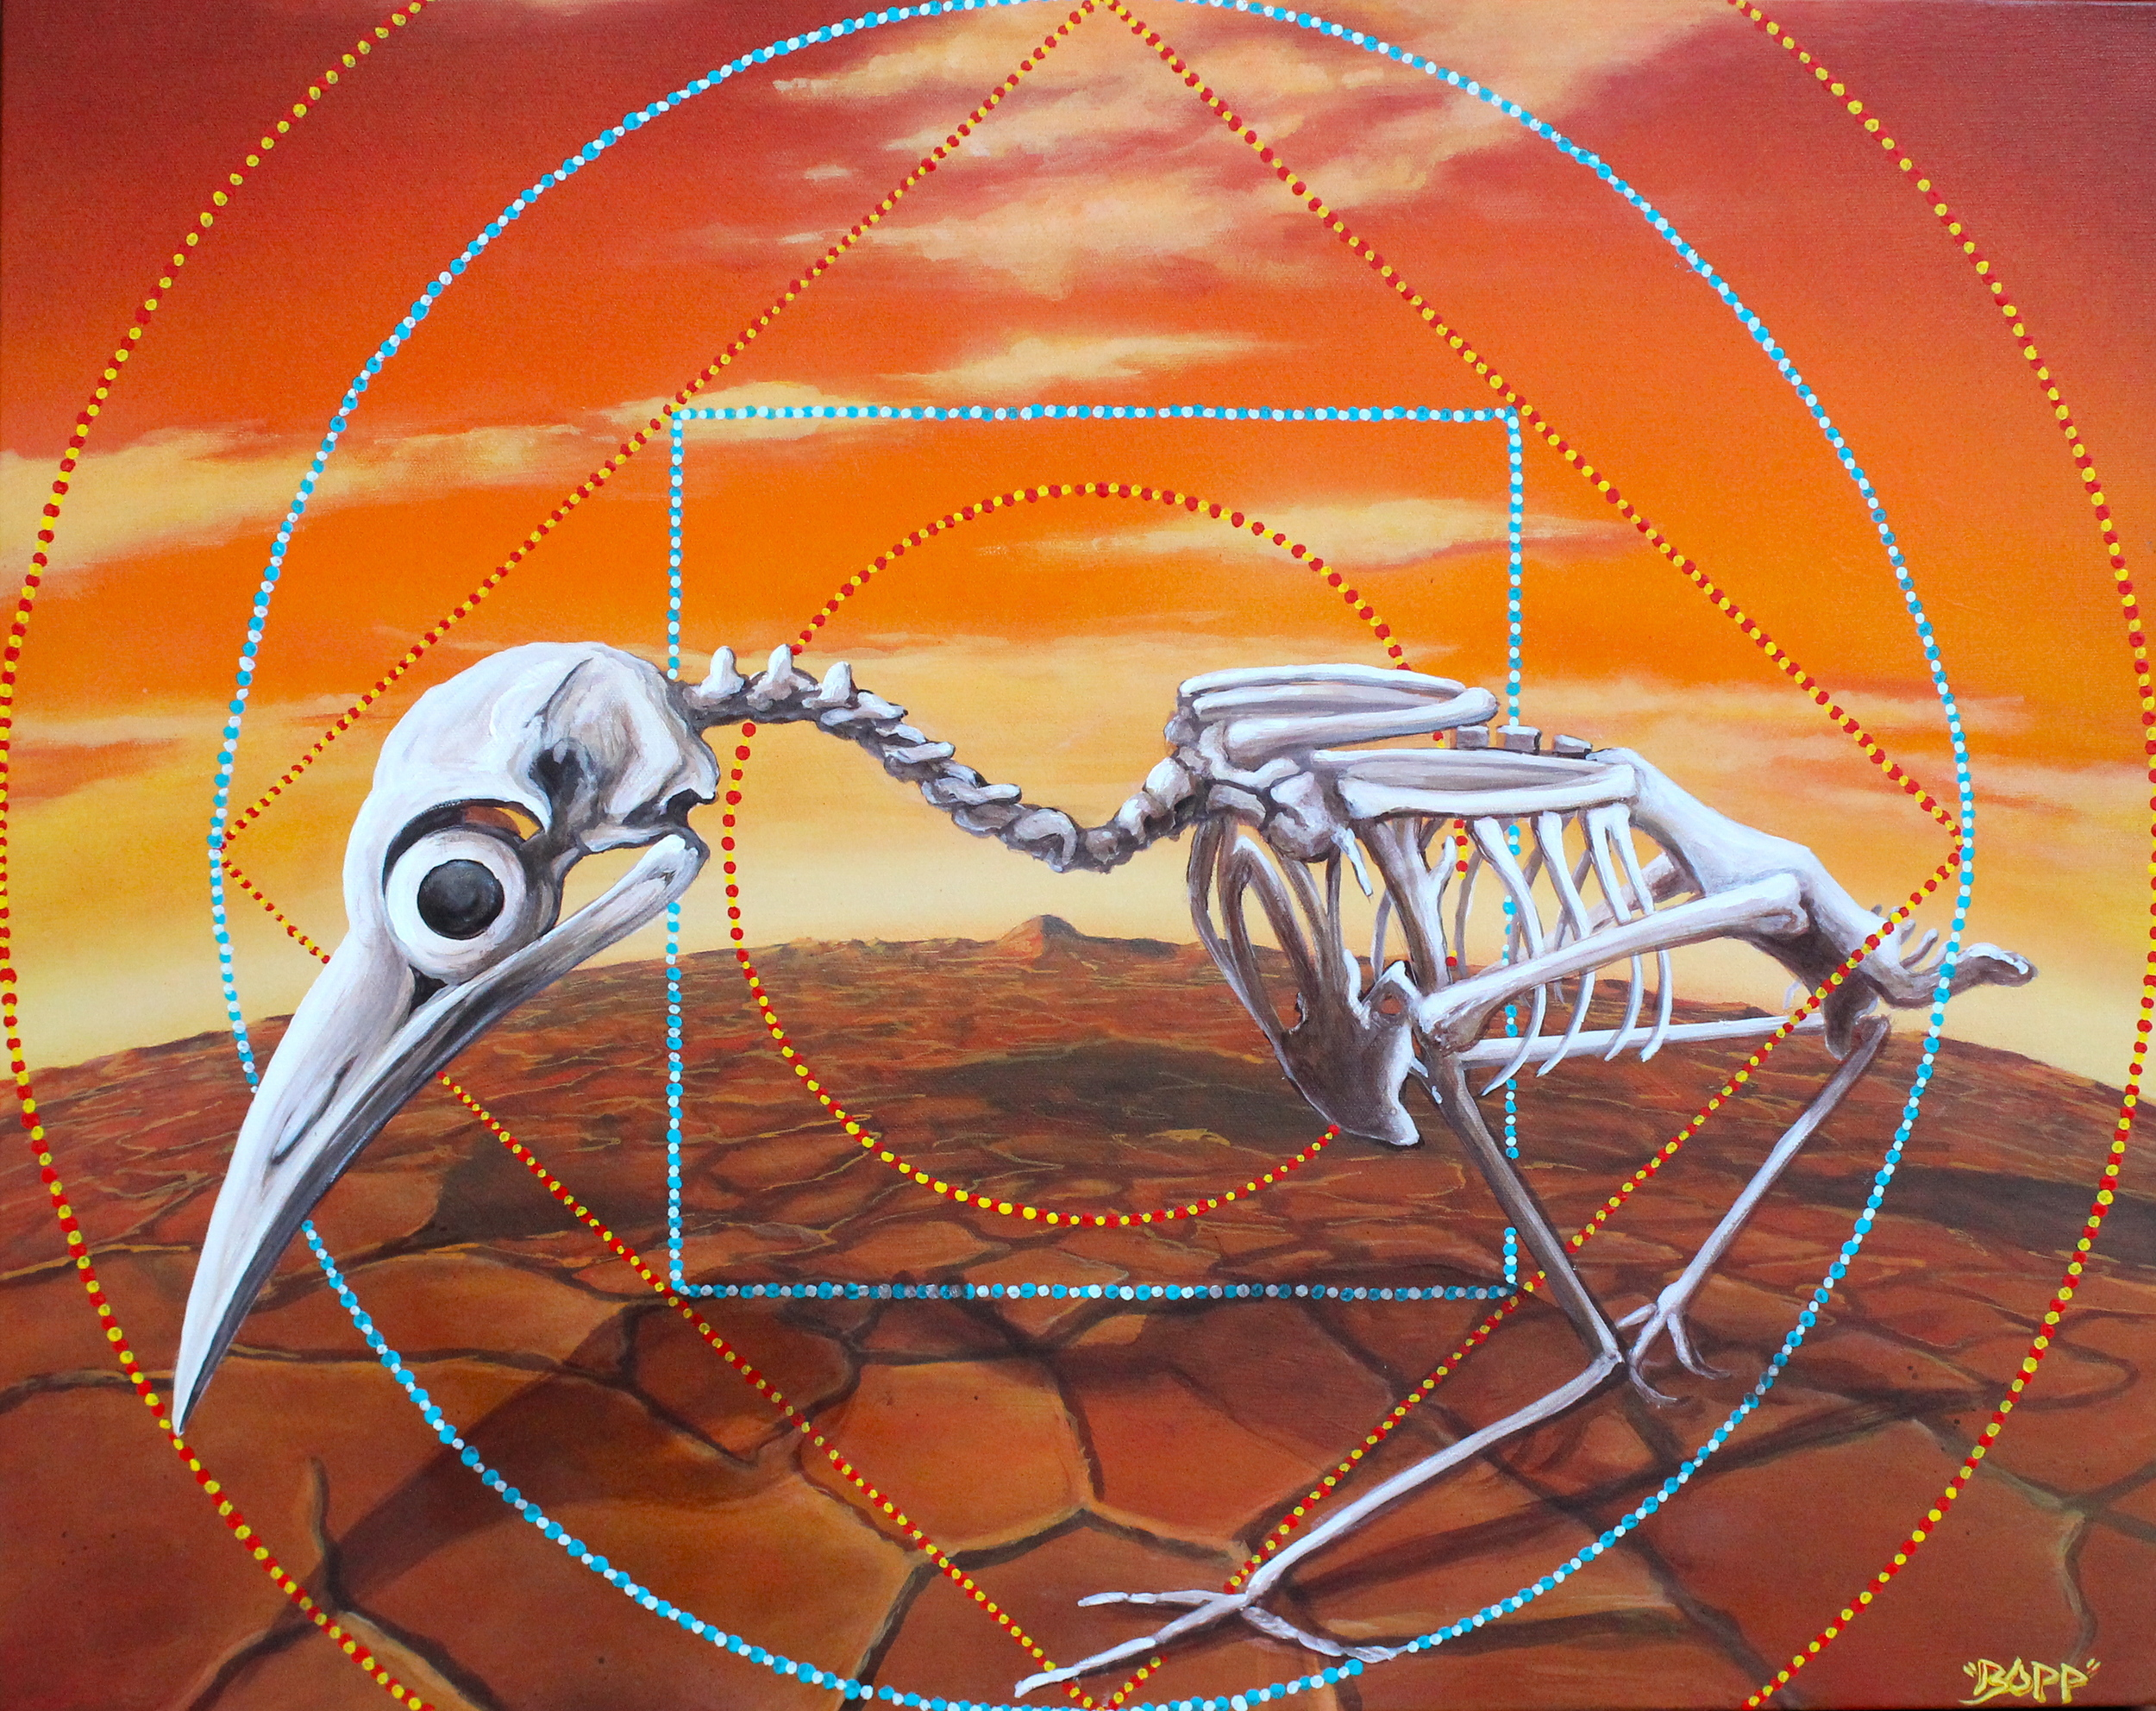 'Life on Mars' Acrylic and Aerosol on canvas 30''x24''